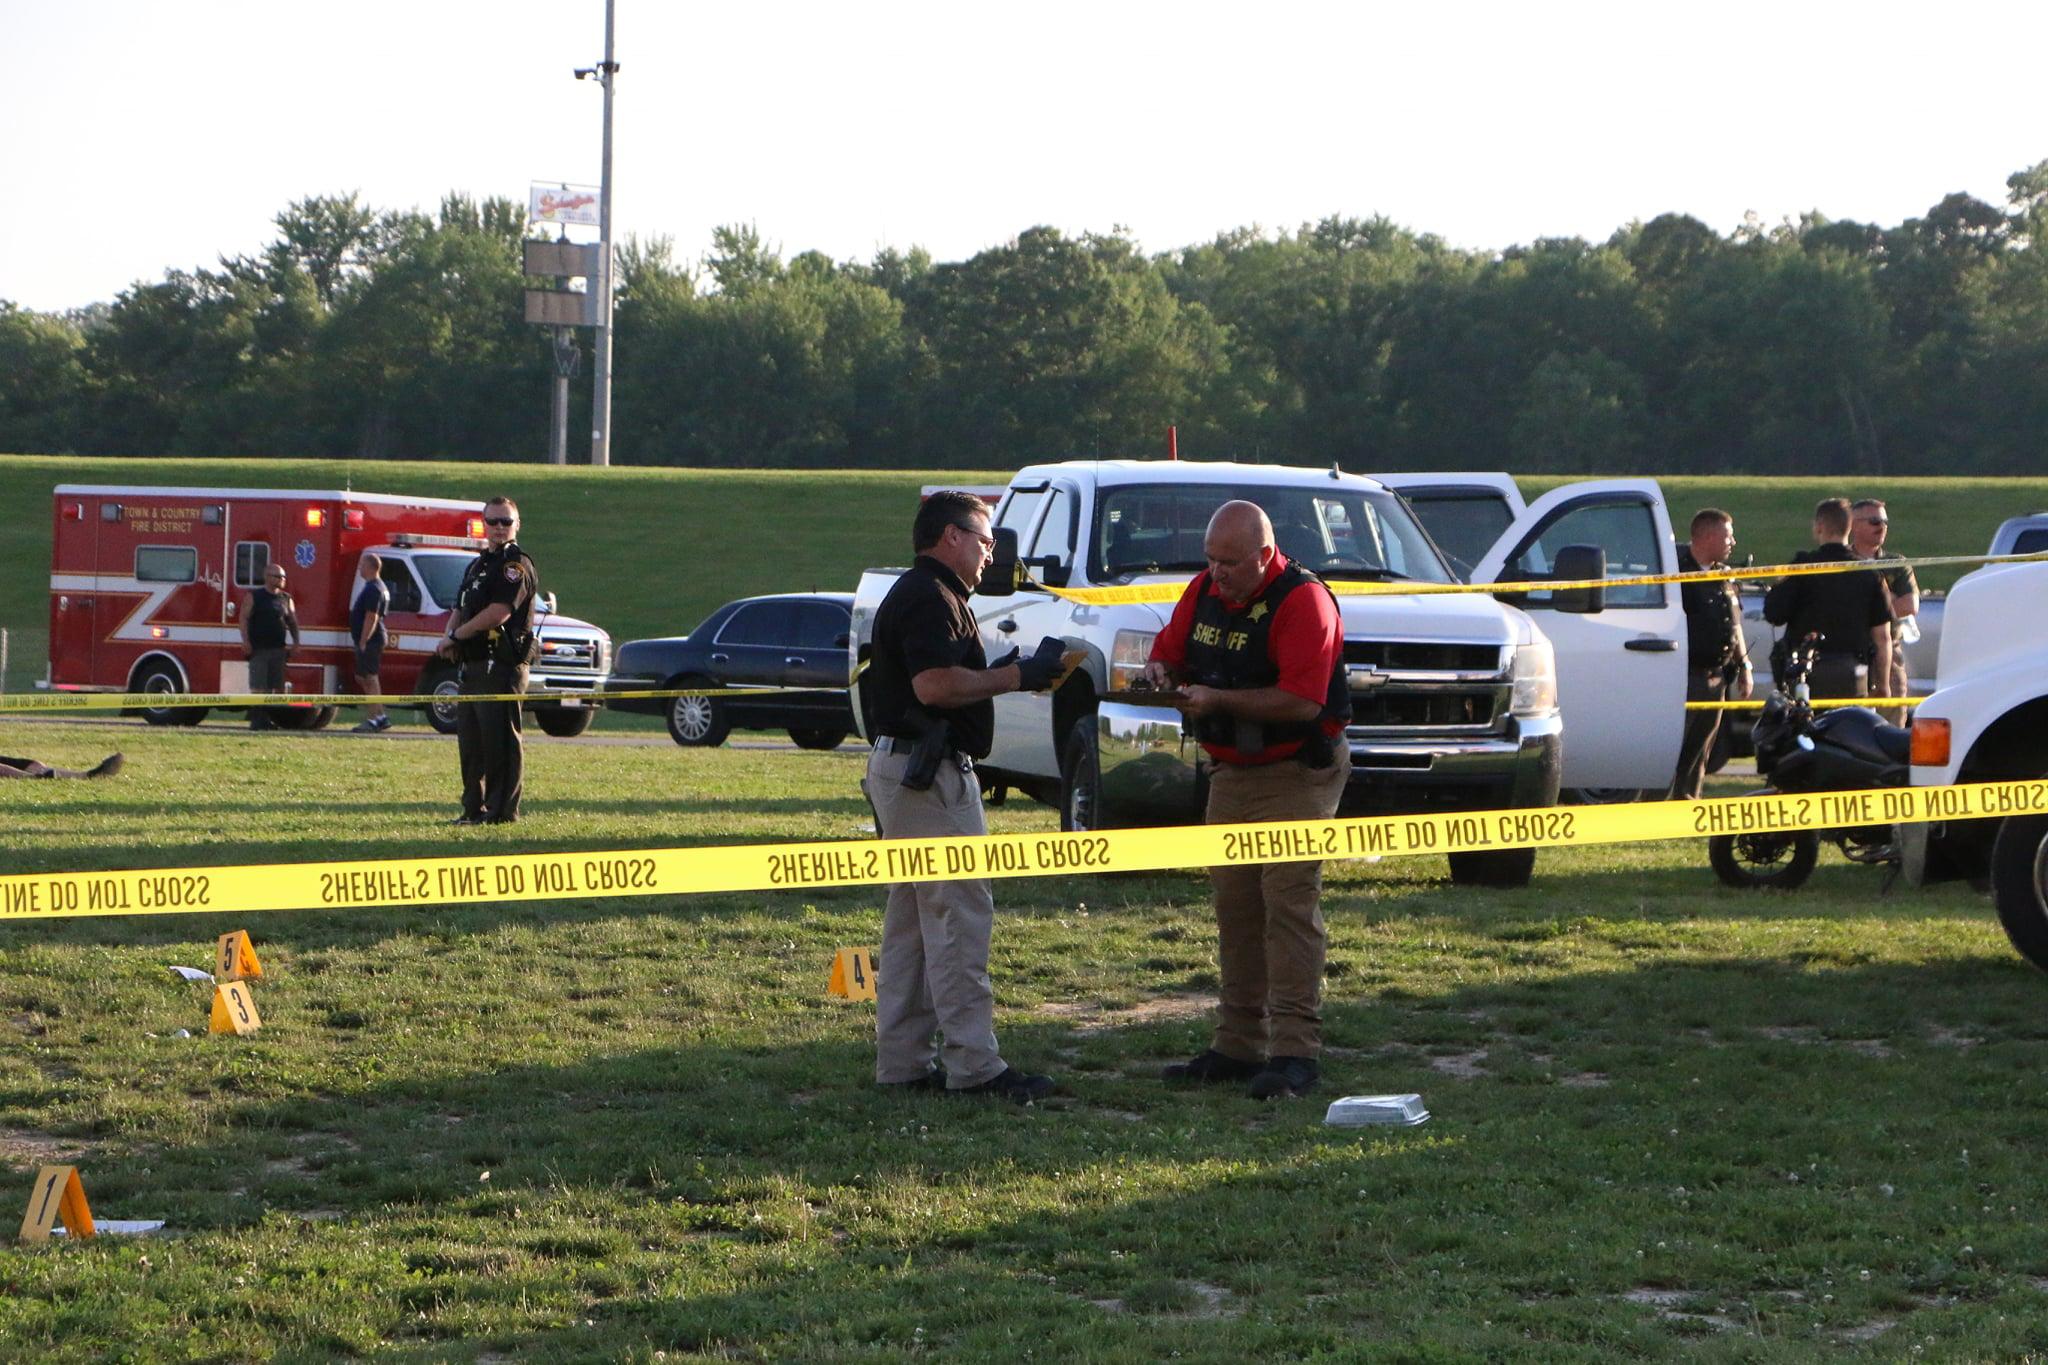 One dead, three injured in weekend shooting at Ohio dragway